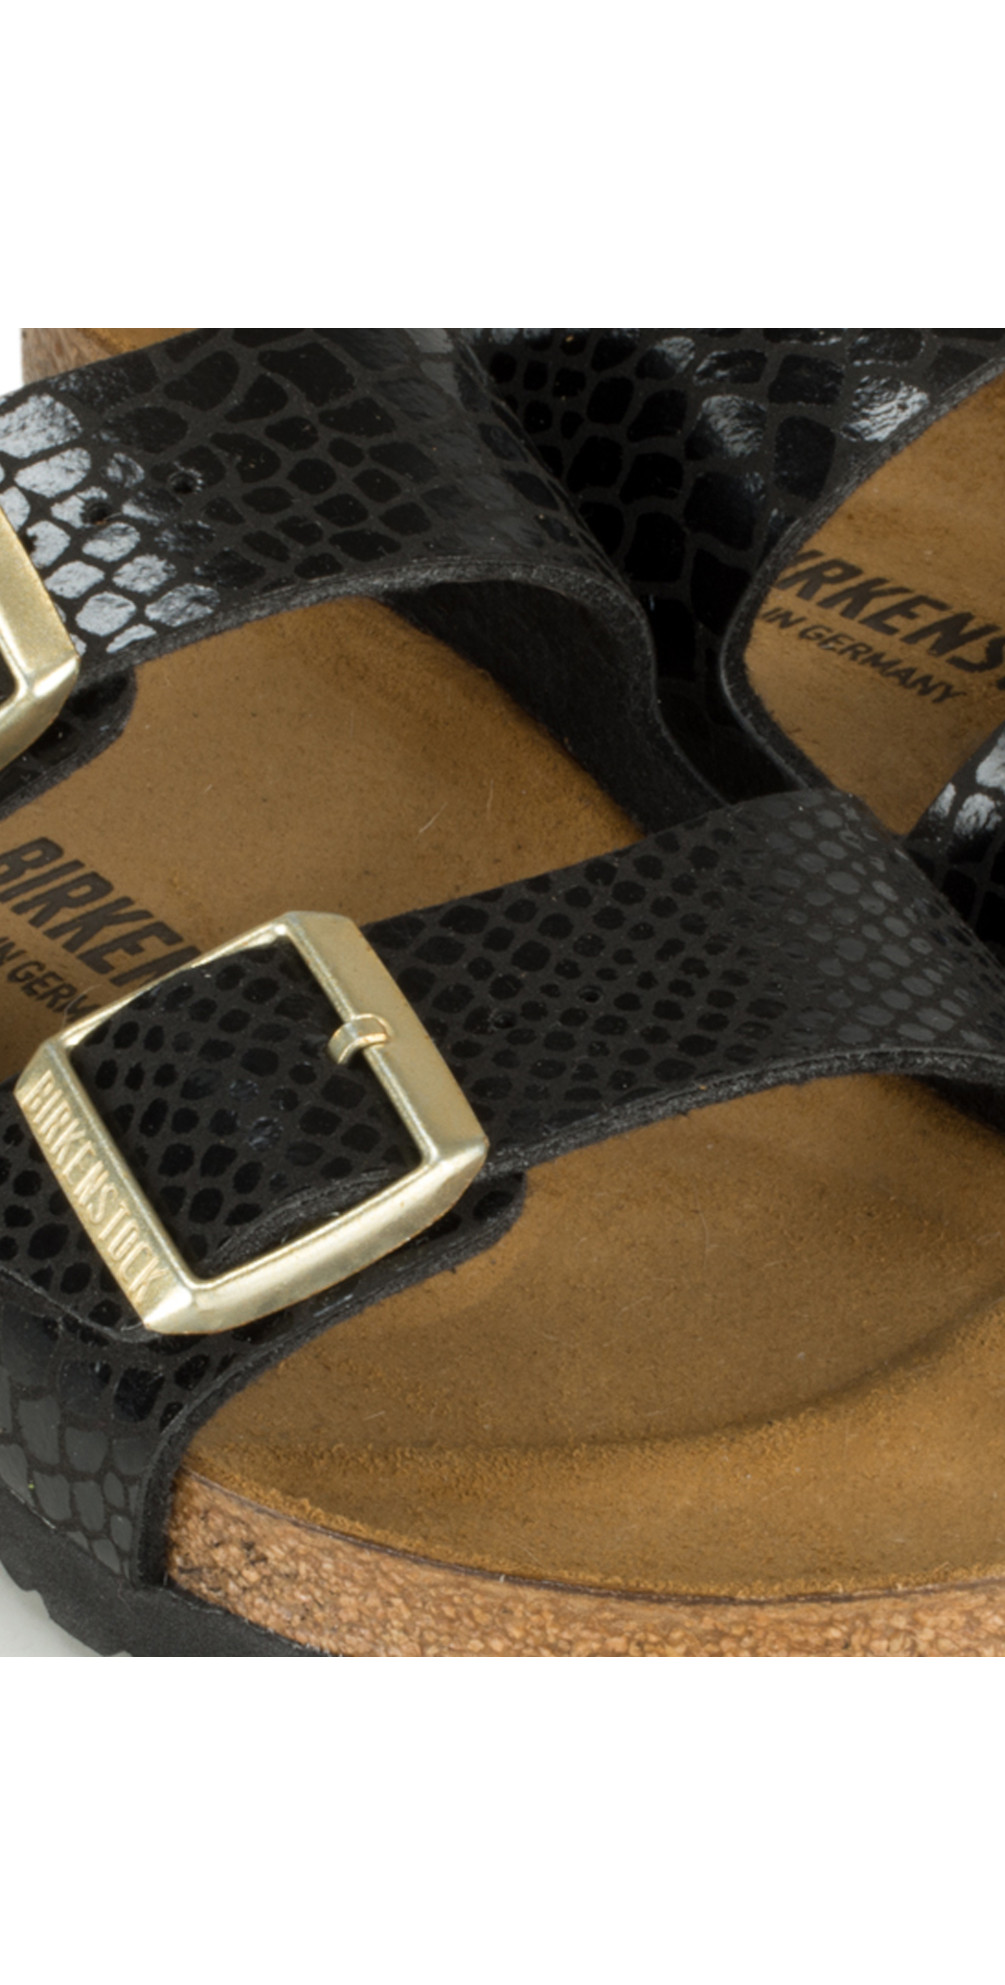 599d0b1f1aa Birkenstock Arizona Birko Flor Shiny Snake Sandal in Black